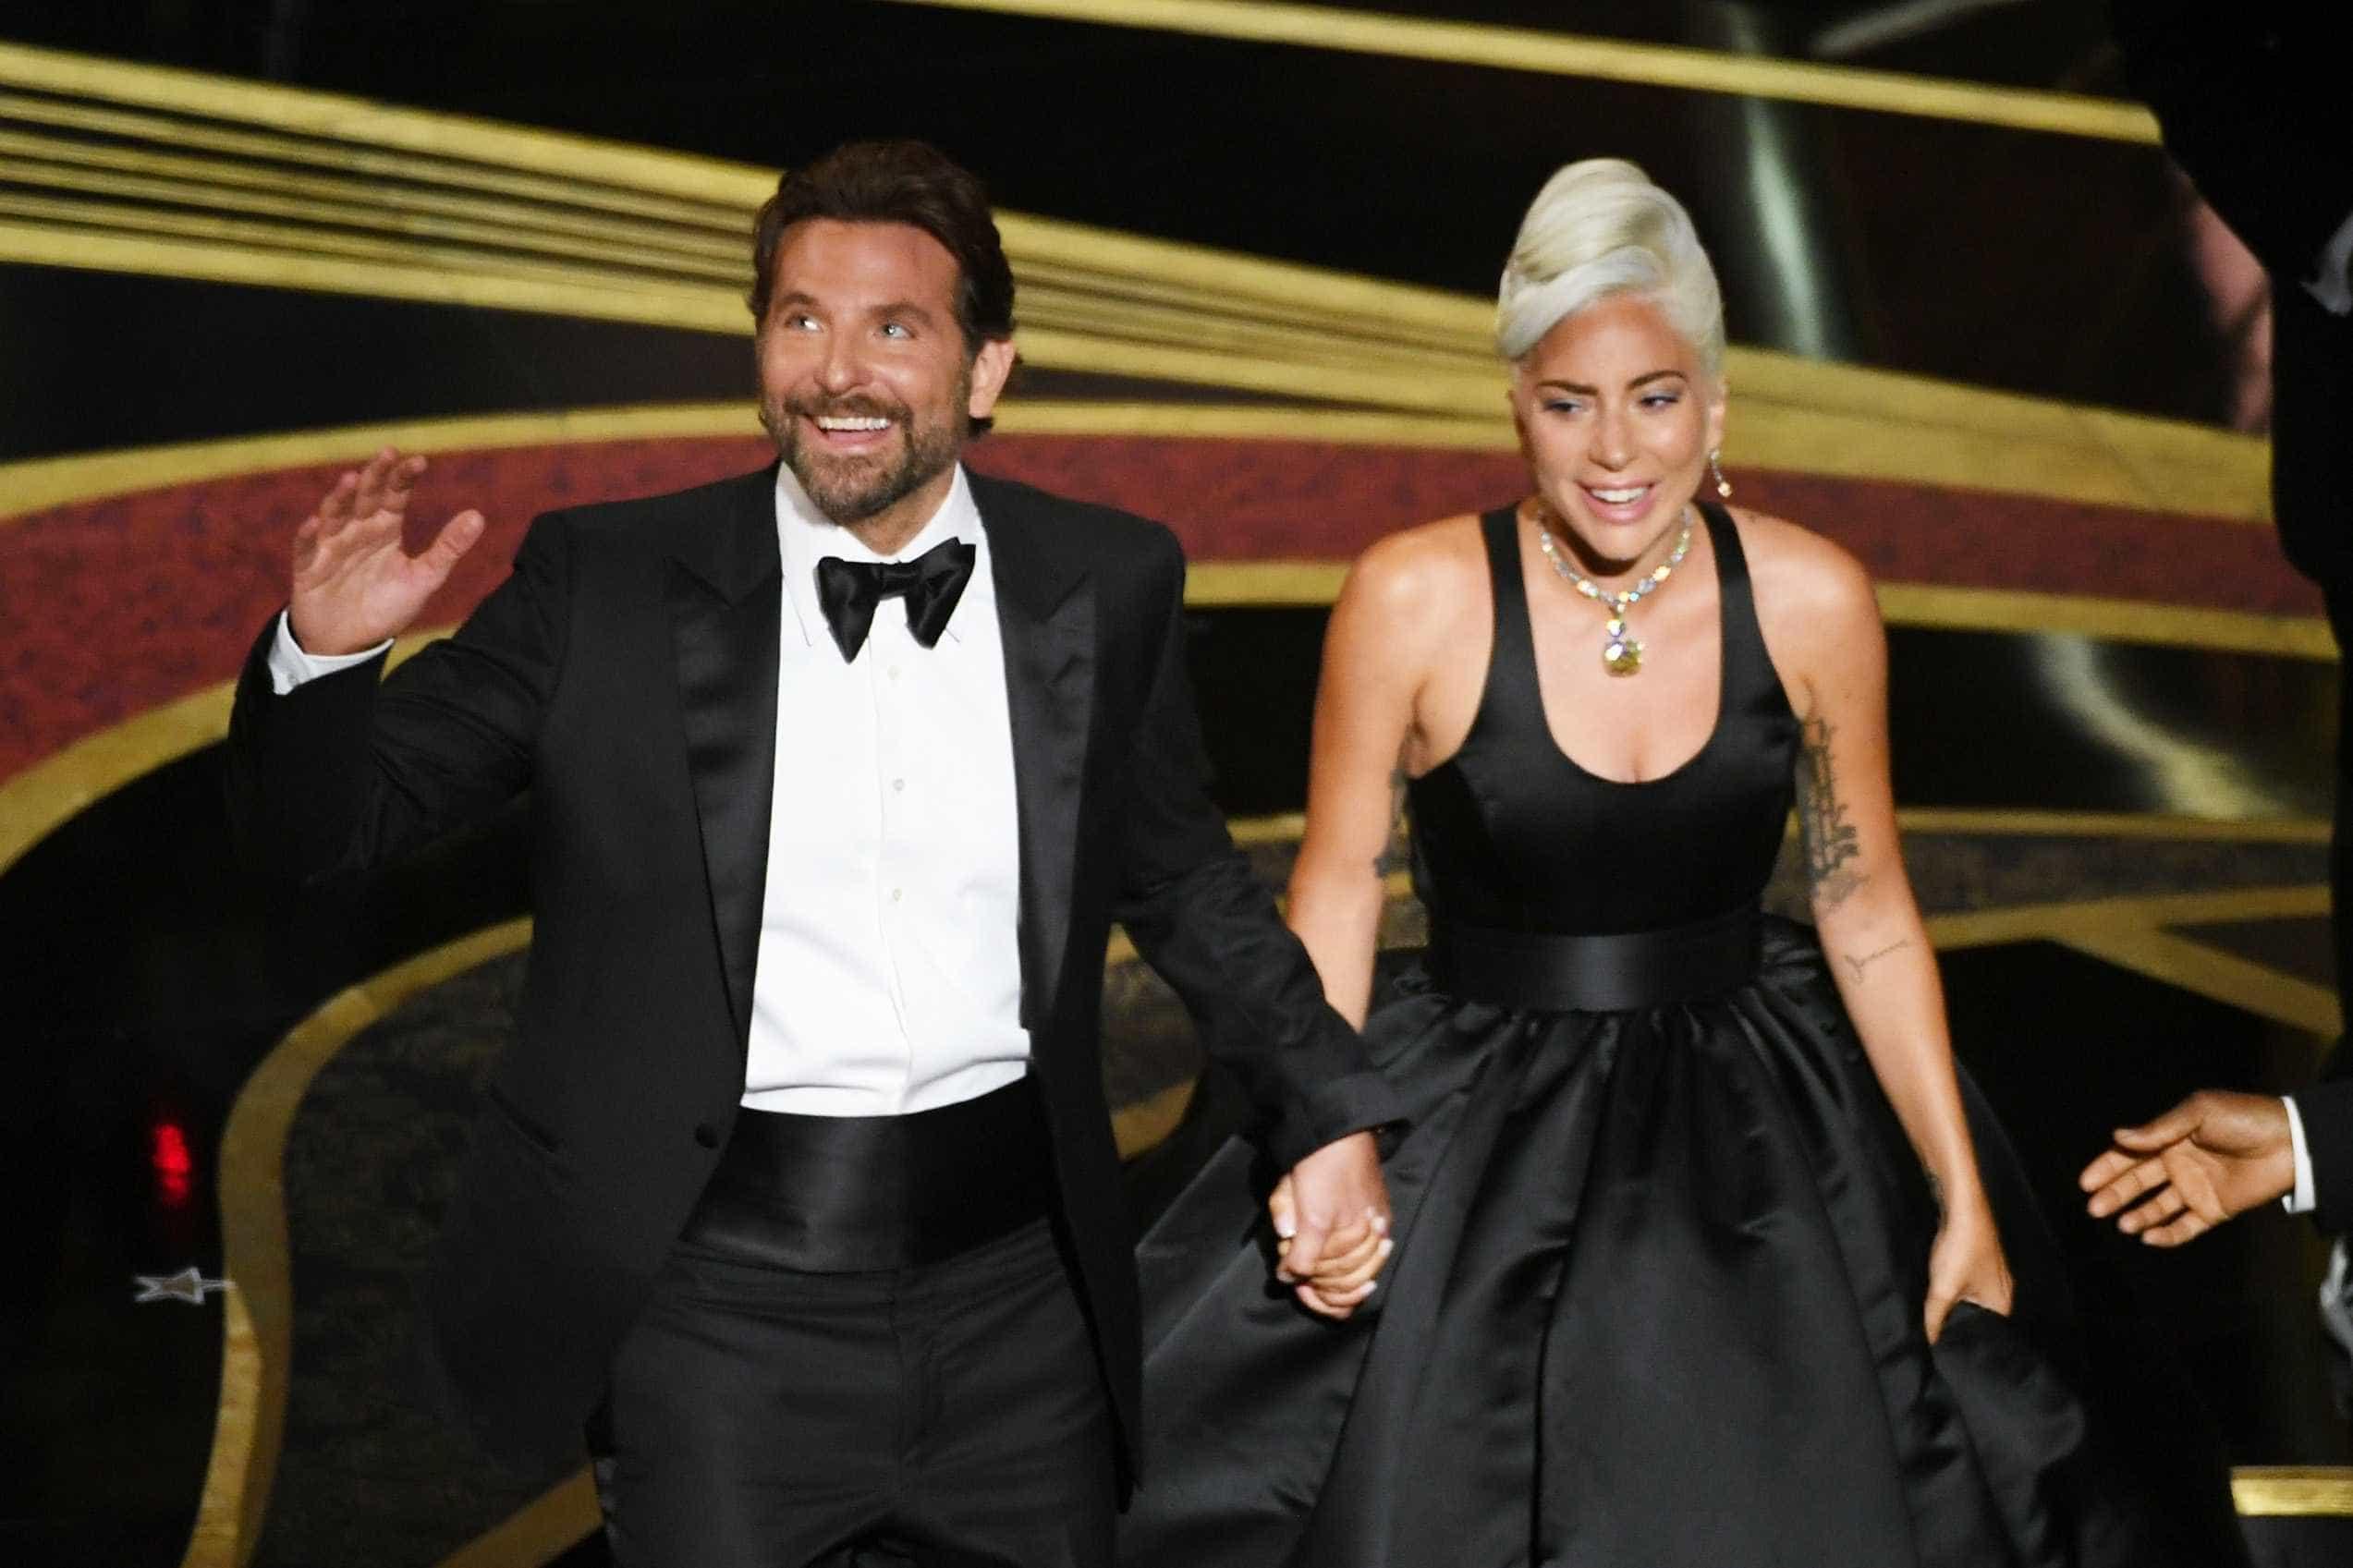 Sabe quanto custou o vestido que Lady Gaga levou aos Óscares?